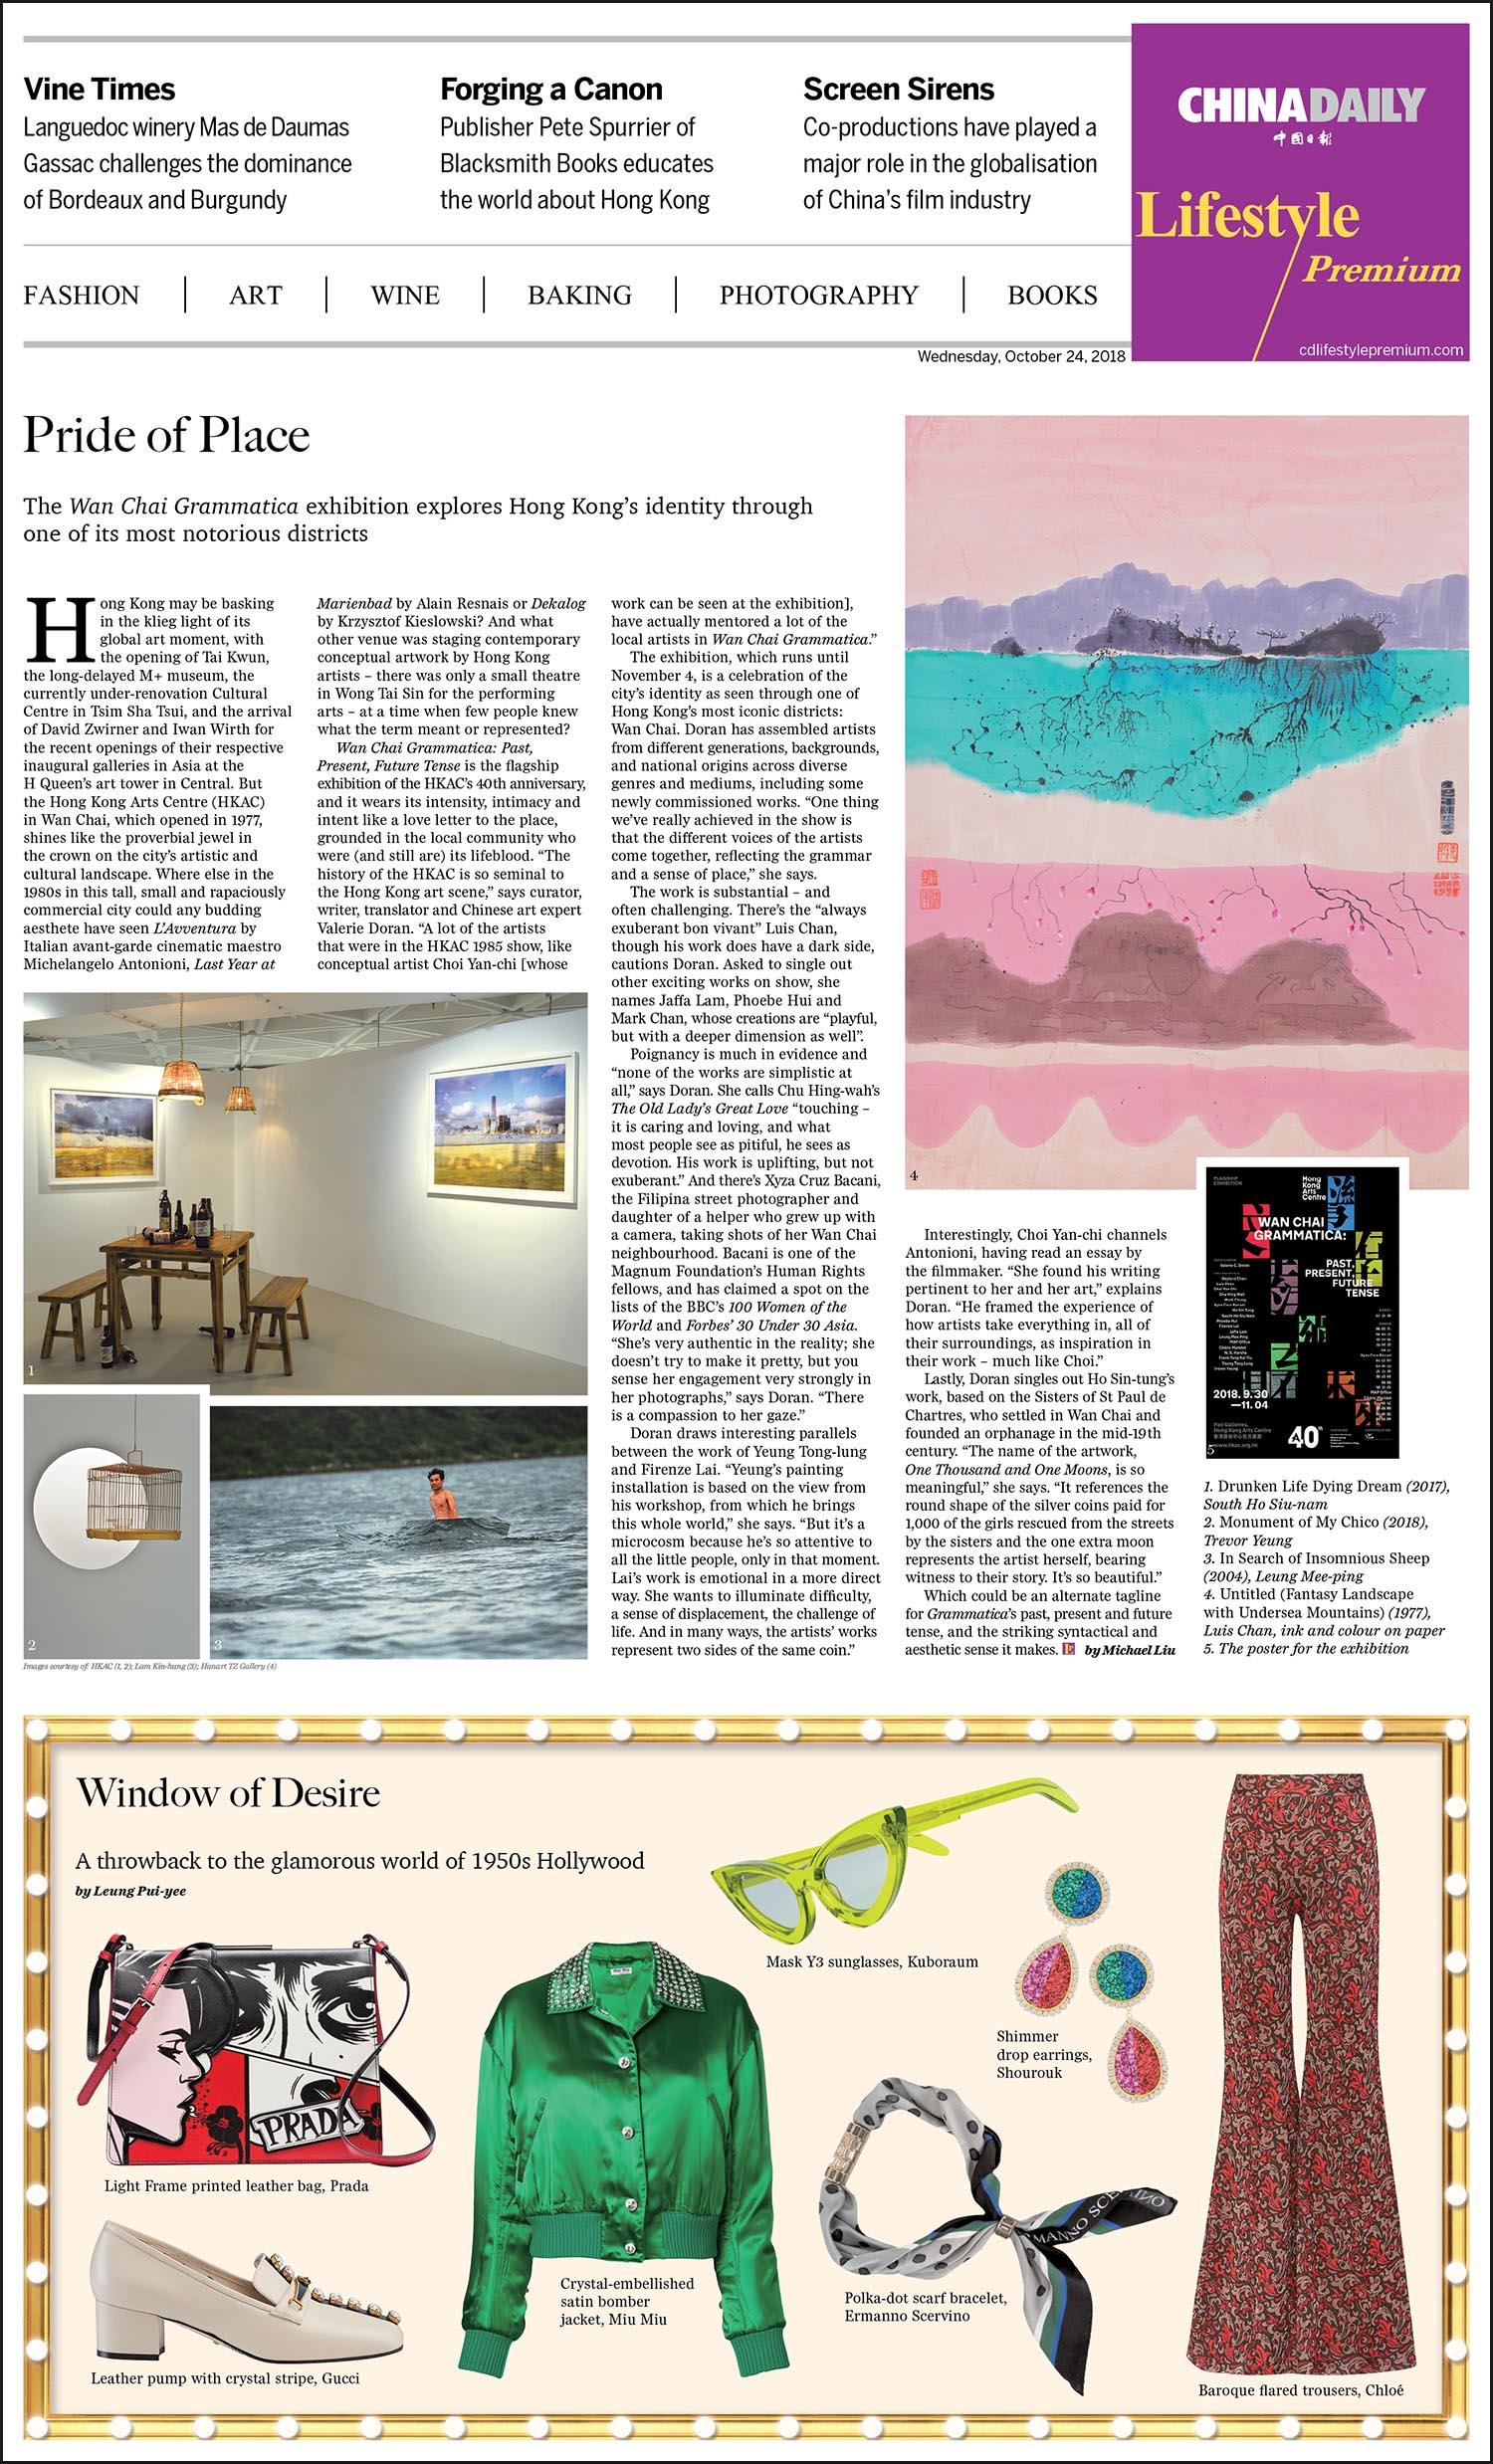 October 24 Issue